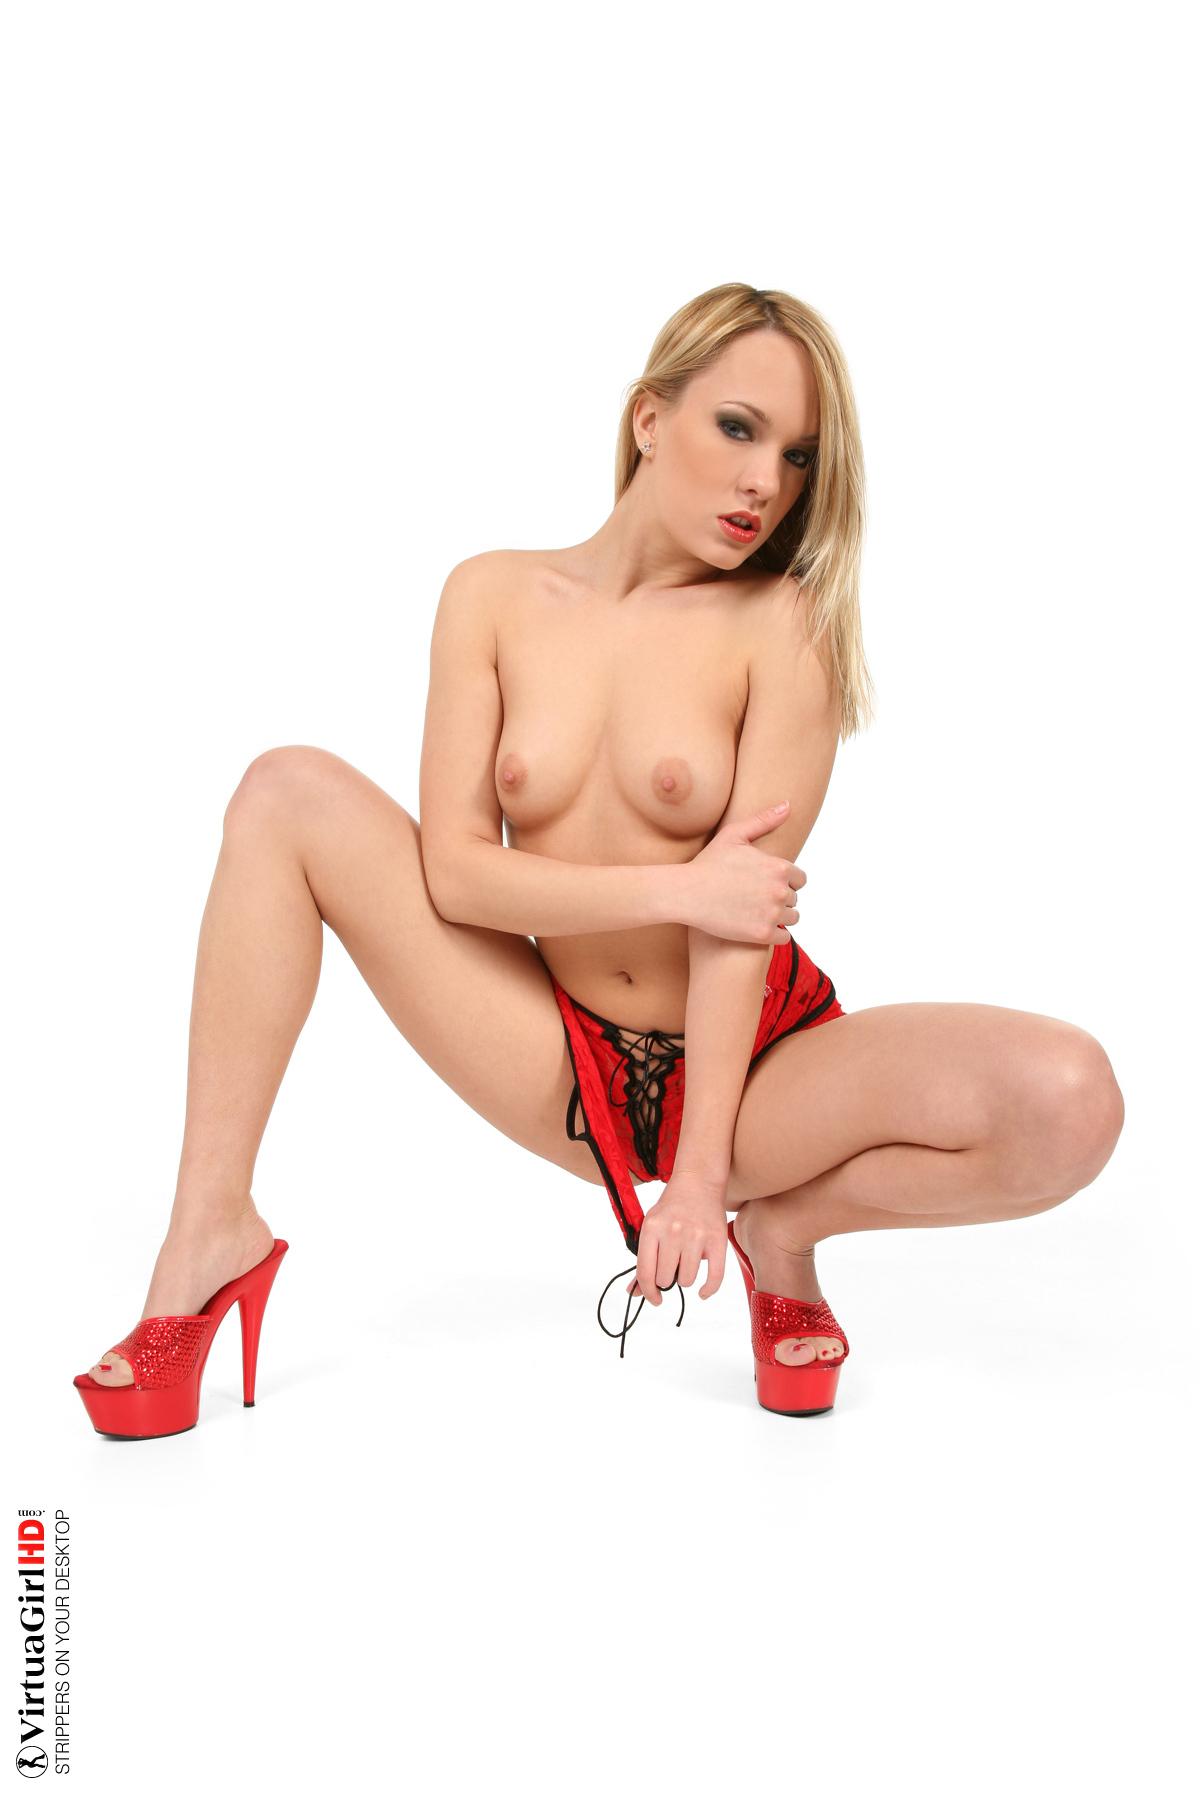 girls stripping sex